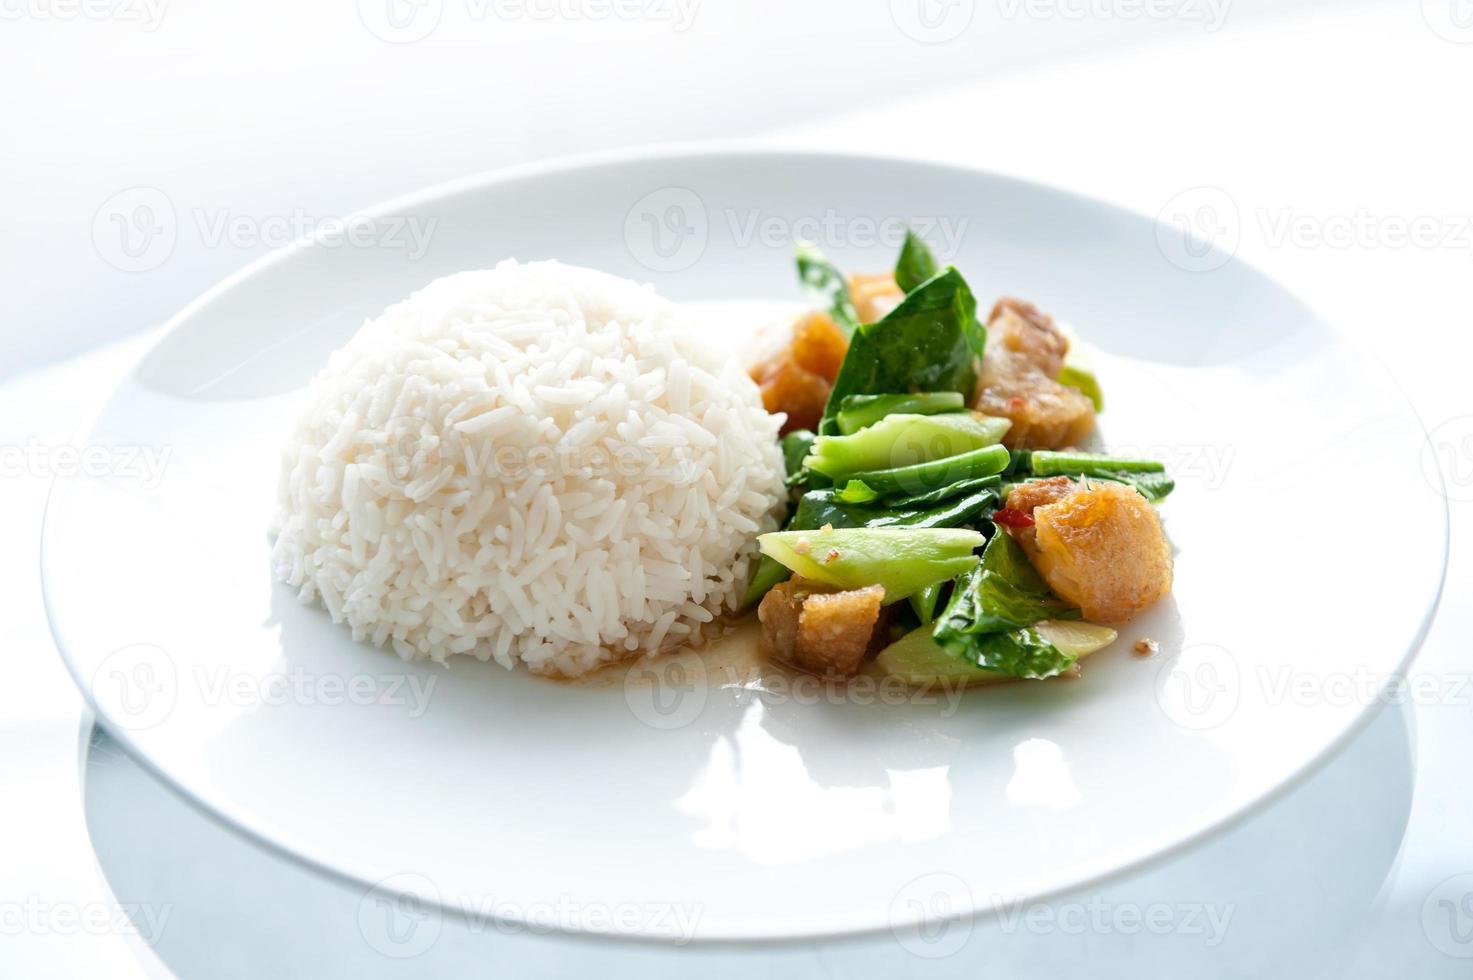 Rör stekt grönkål med saltad fisk-kinesisk mat foto